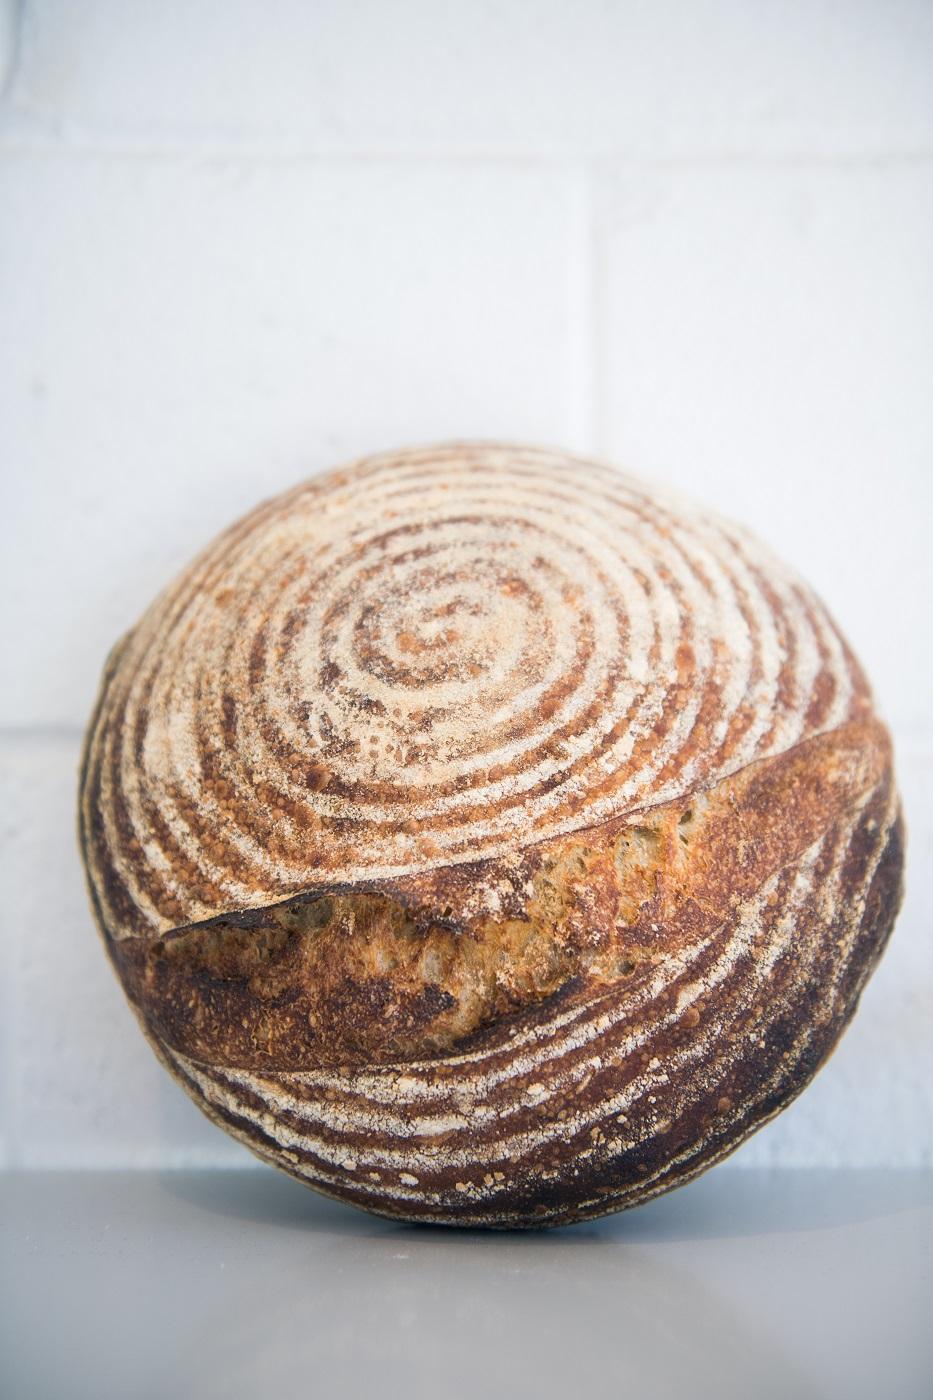 Verdant Bread